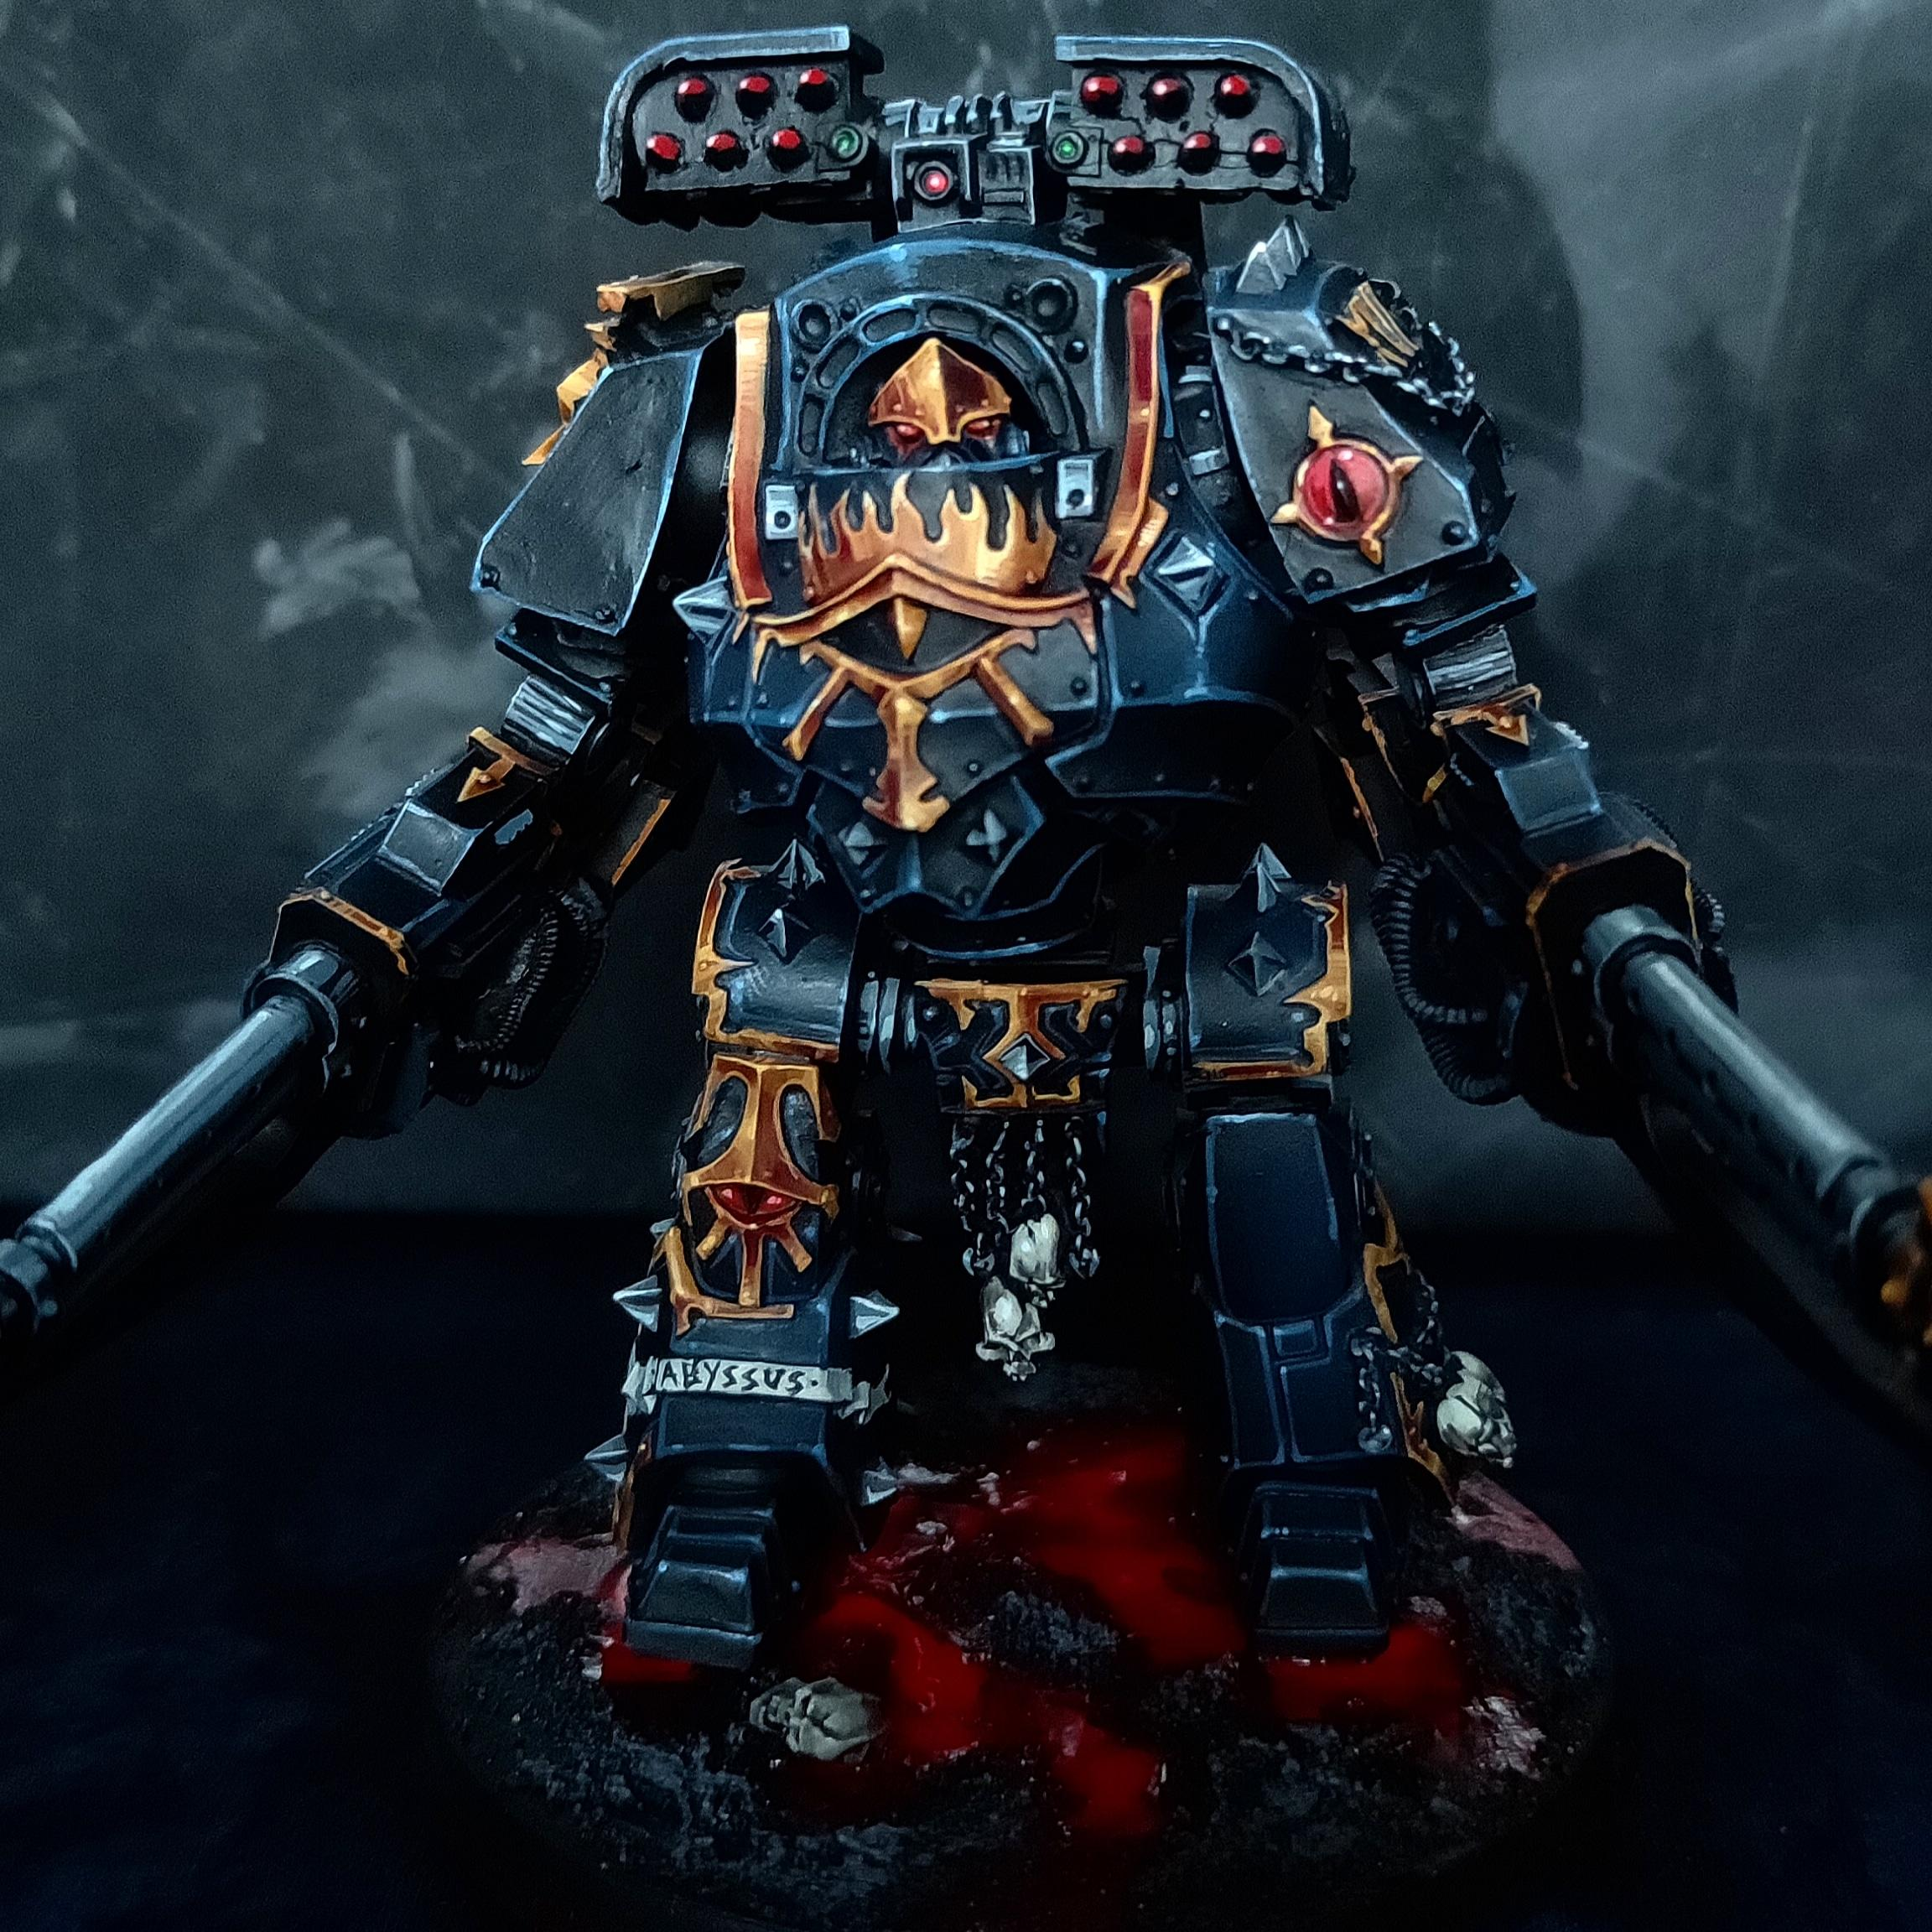 Black Legion, Blacklegion, Chaos, Chaos Knight, Chaos Space Marines, Chaos Undivided, Chaosspacemarine, Chaosspacemarines, Chaosundivided, Contemptor, Dreadnought, Forge World, Hellforgedcontemptordreadnought, Heretic Astartes, Khorne, Nurgle, Sin Eaters, Sineaters, Slaanesh, Tzeentch, Warhammer 40,000, Warhammer Fantasy